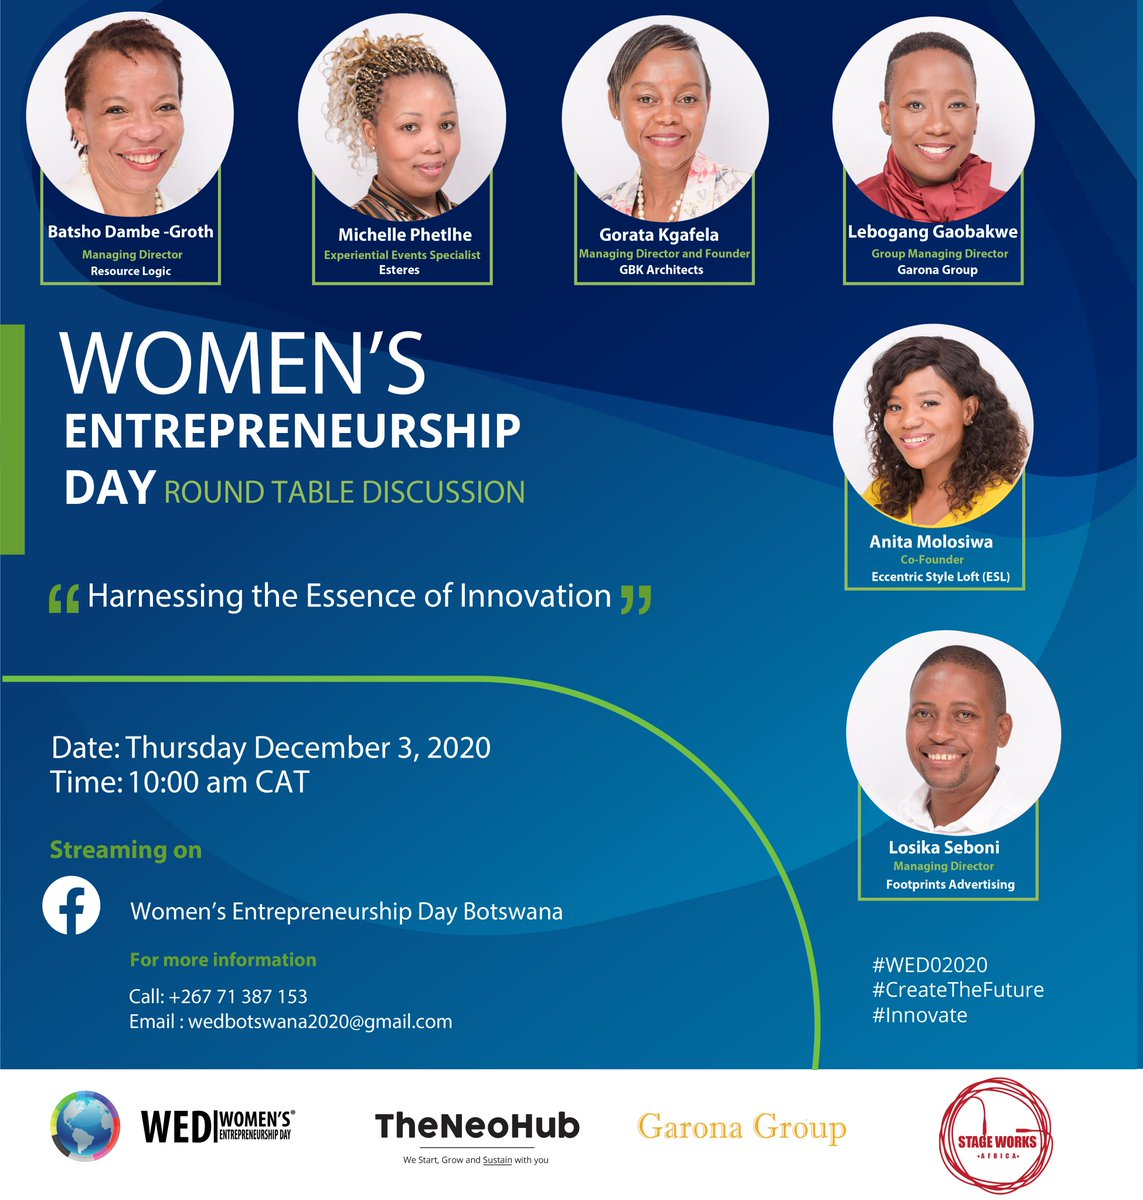 Thursday 3rd December on #womensentrepreneurshipday we celebrate industry captains. Join us as we engage with these inspiring women entrepreneurs. #WEDO2020  #CreateTheFuture  #innovate